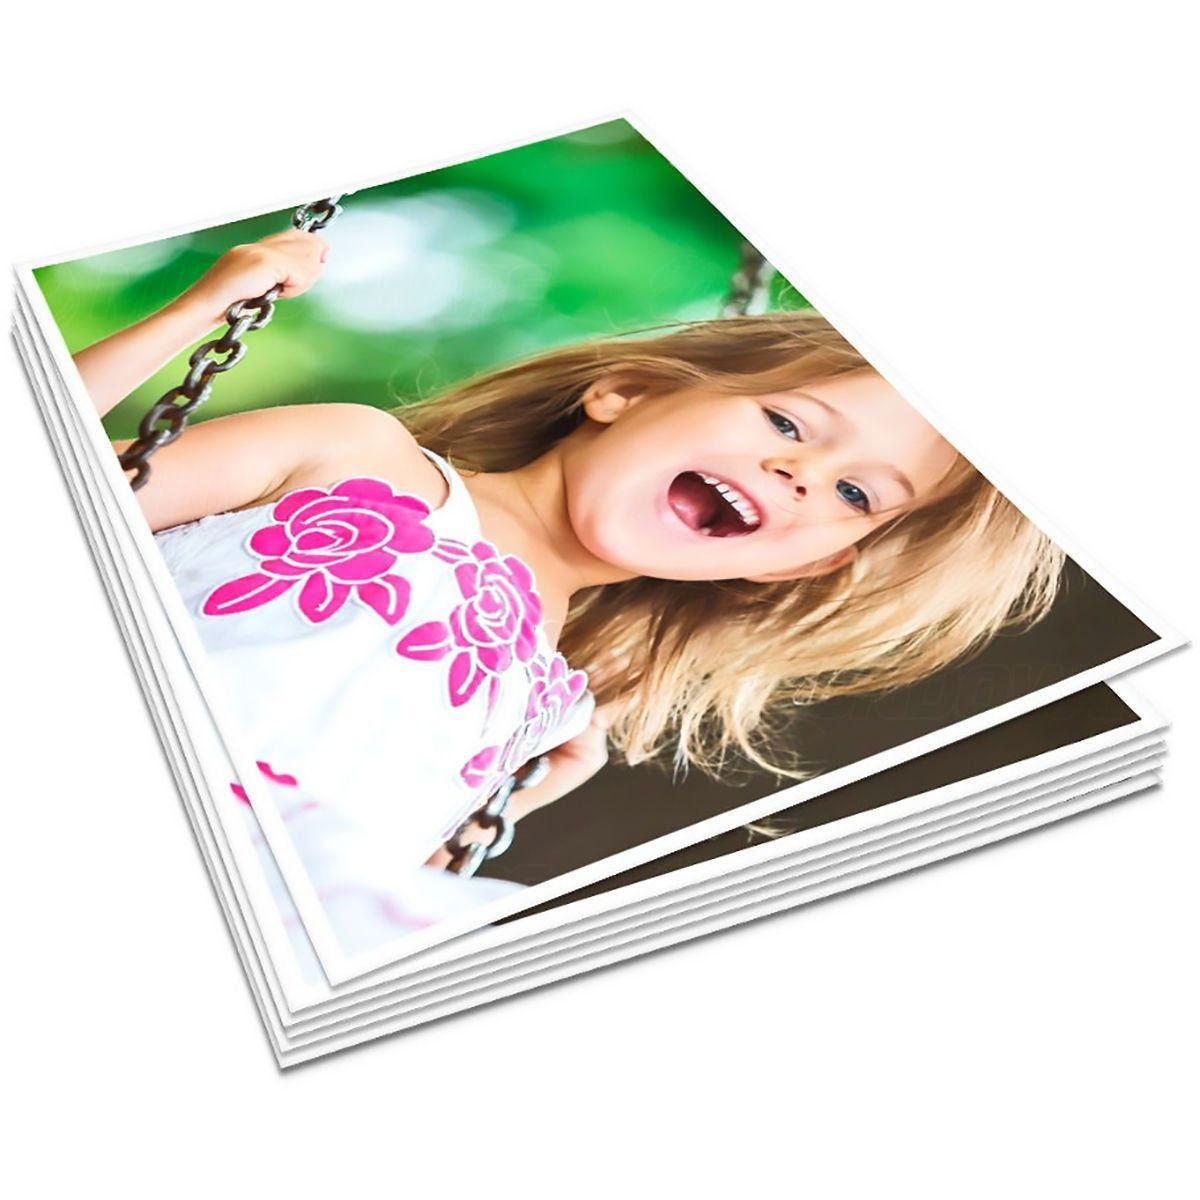 Papel Fotográfico 135g A4  50 Folhas